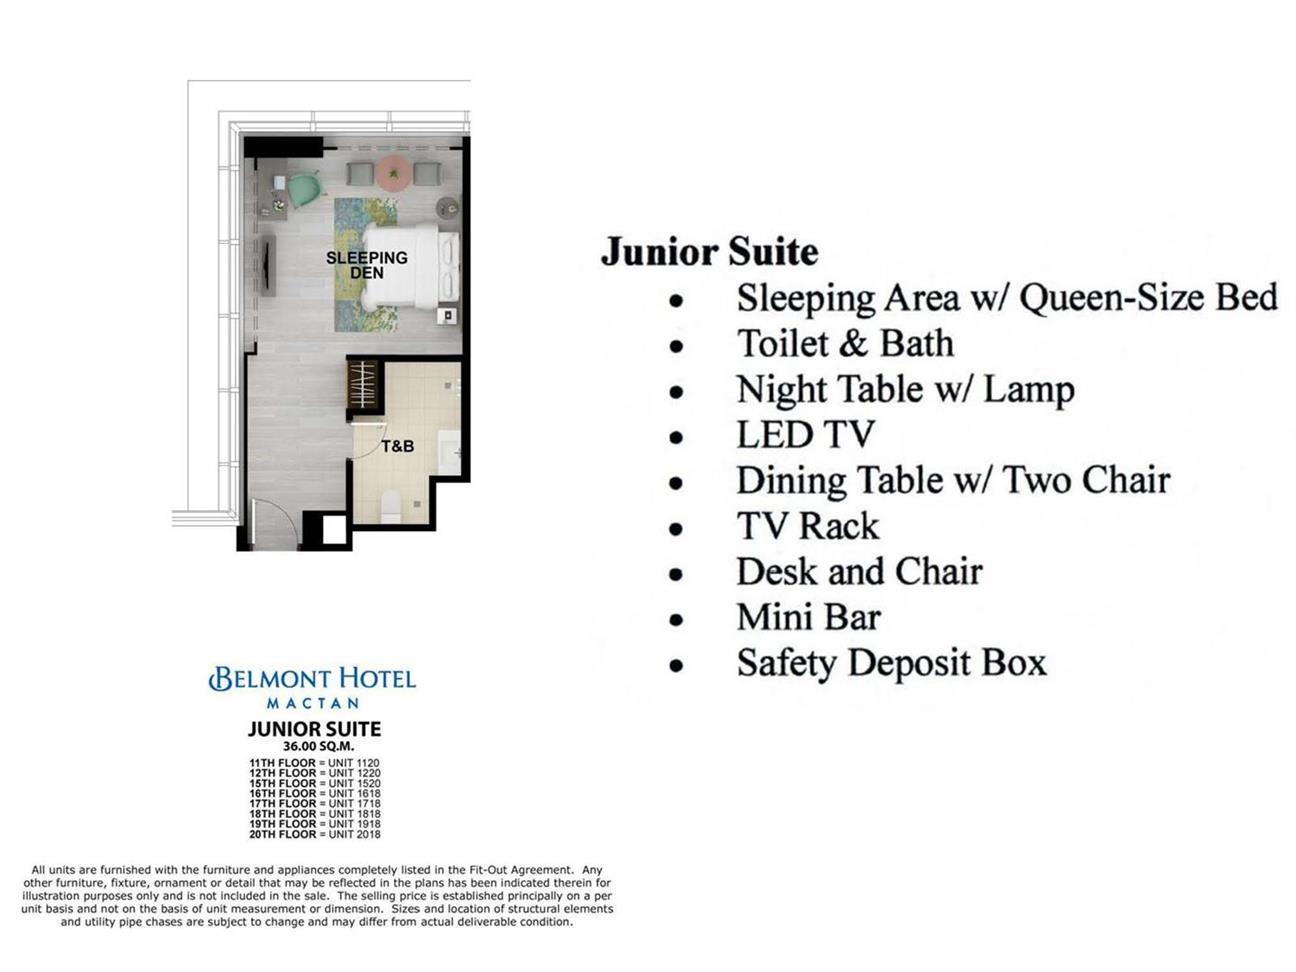 Mactan Belmont Luxury Hotel Unit Layout